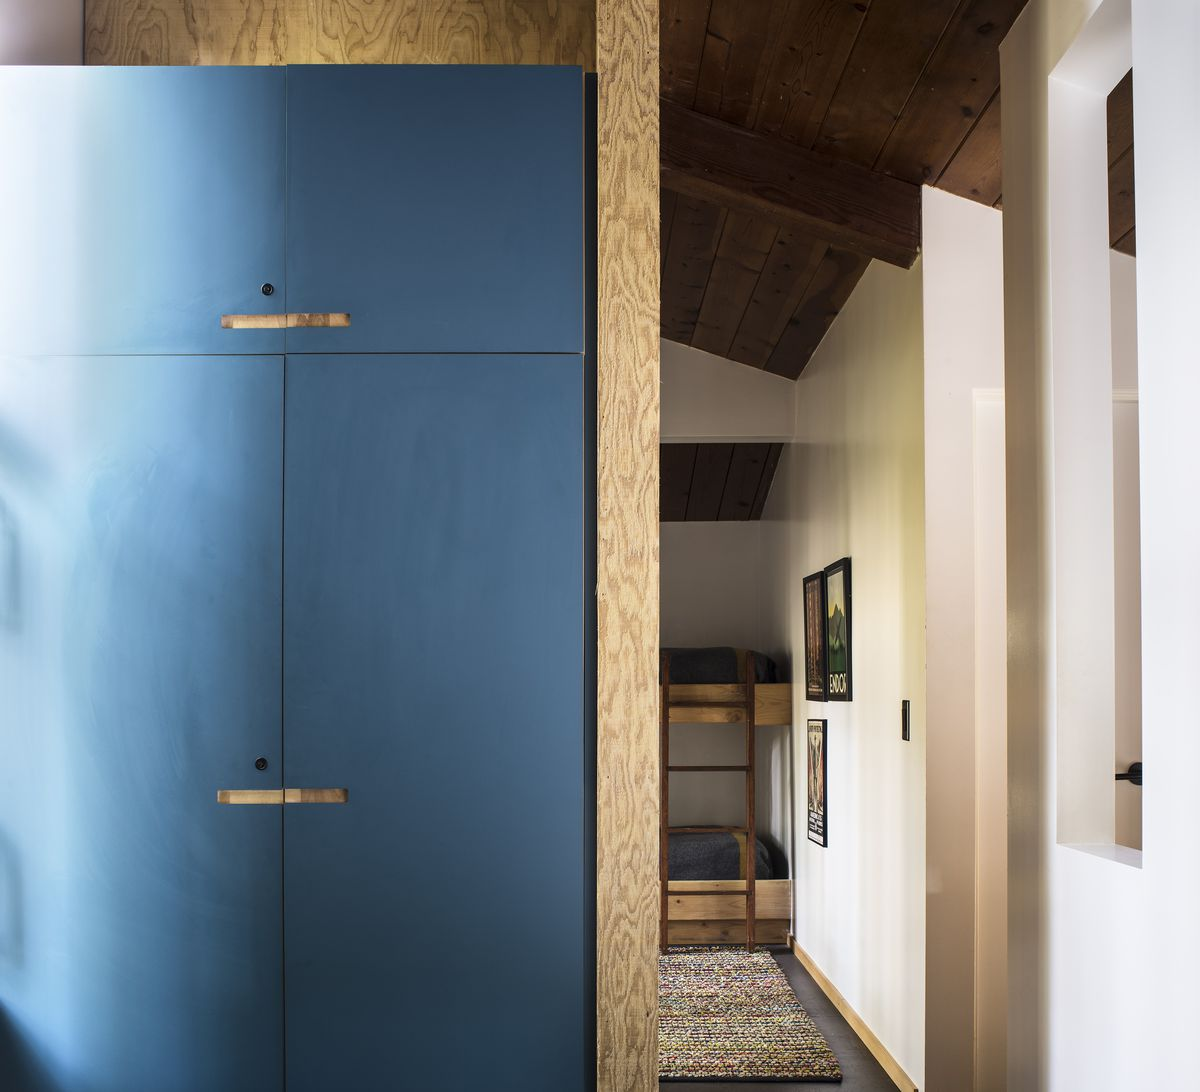 A closet has blue laminate doors.